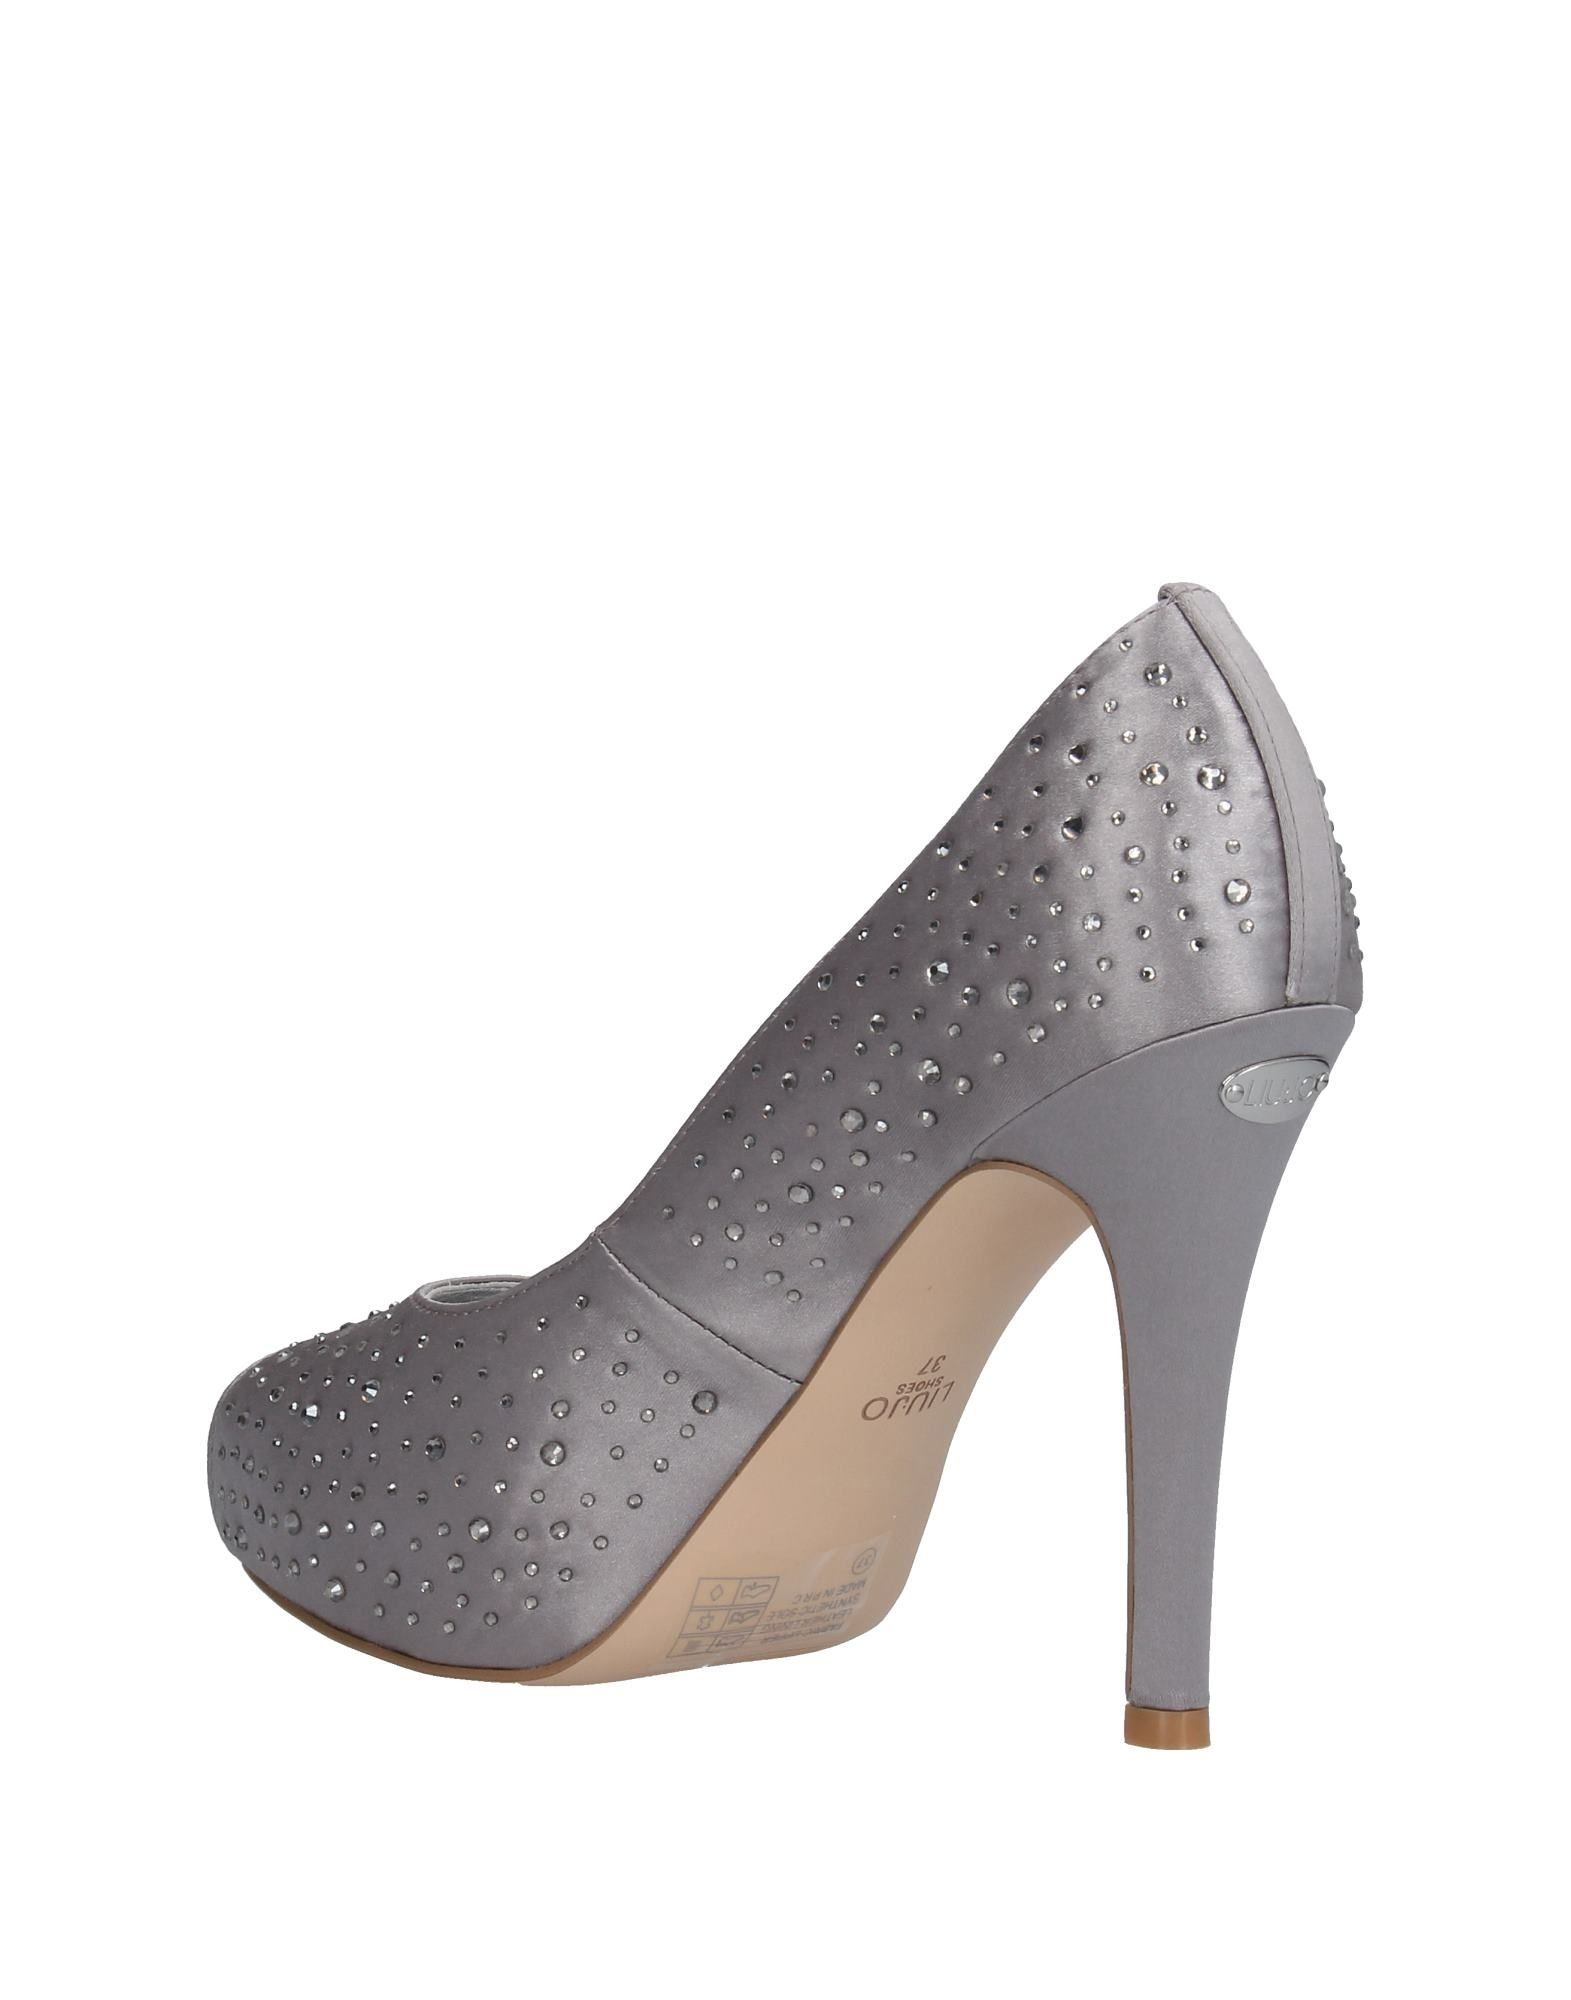 Liu 11109740SH •Jo Shoes Pumps Damen  11109740SH Liu Gute Qualität beliebte Schuhe f24197